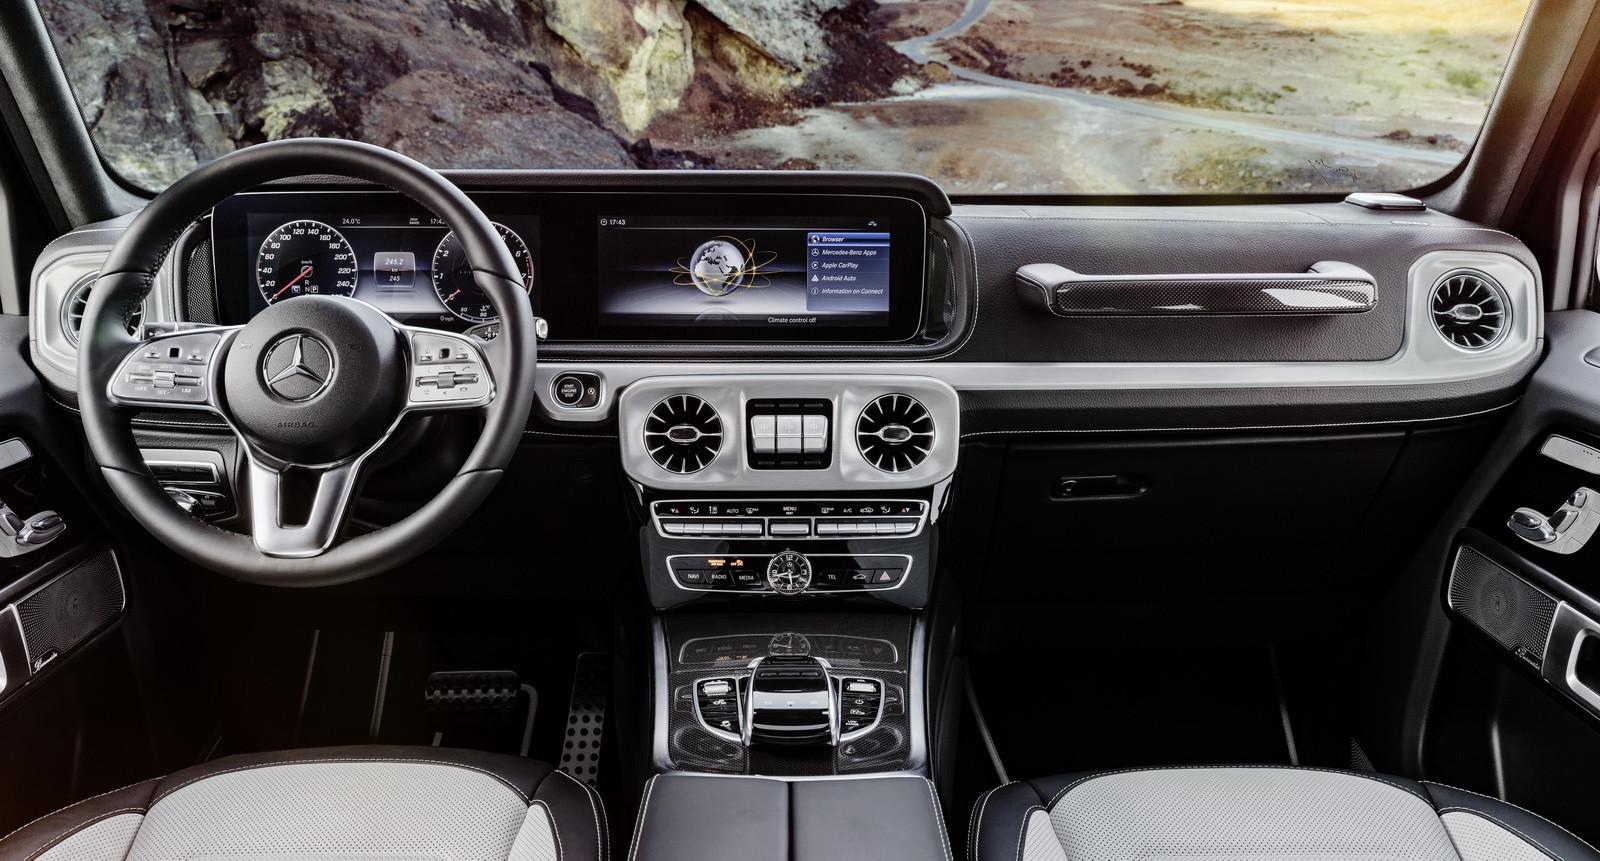 Foto de Mercedes-Benz Clase G 2018, imágenes filtradas (10/24)